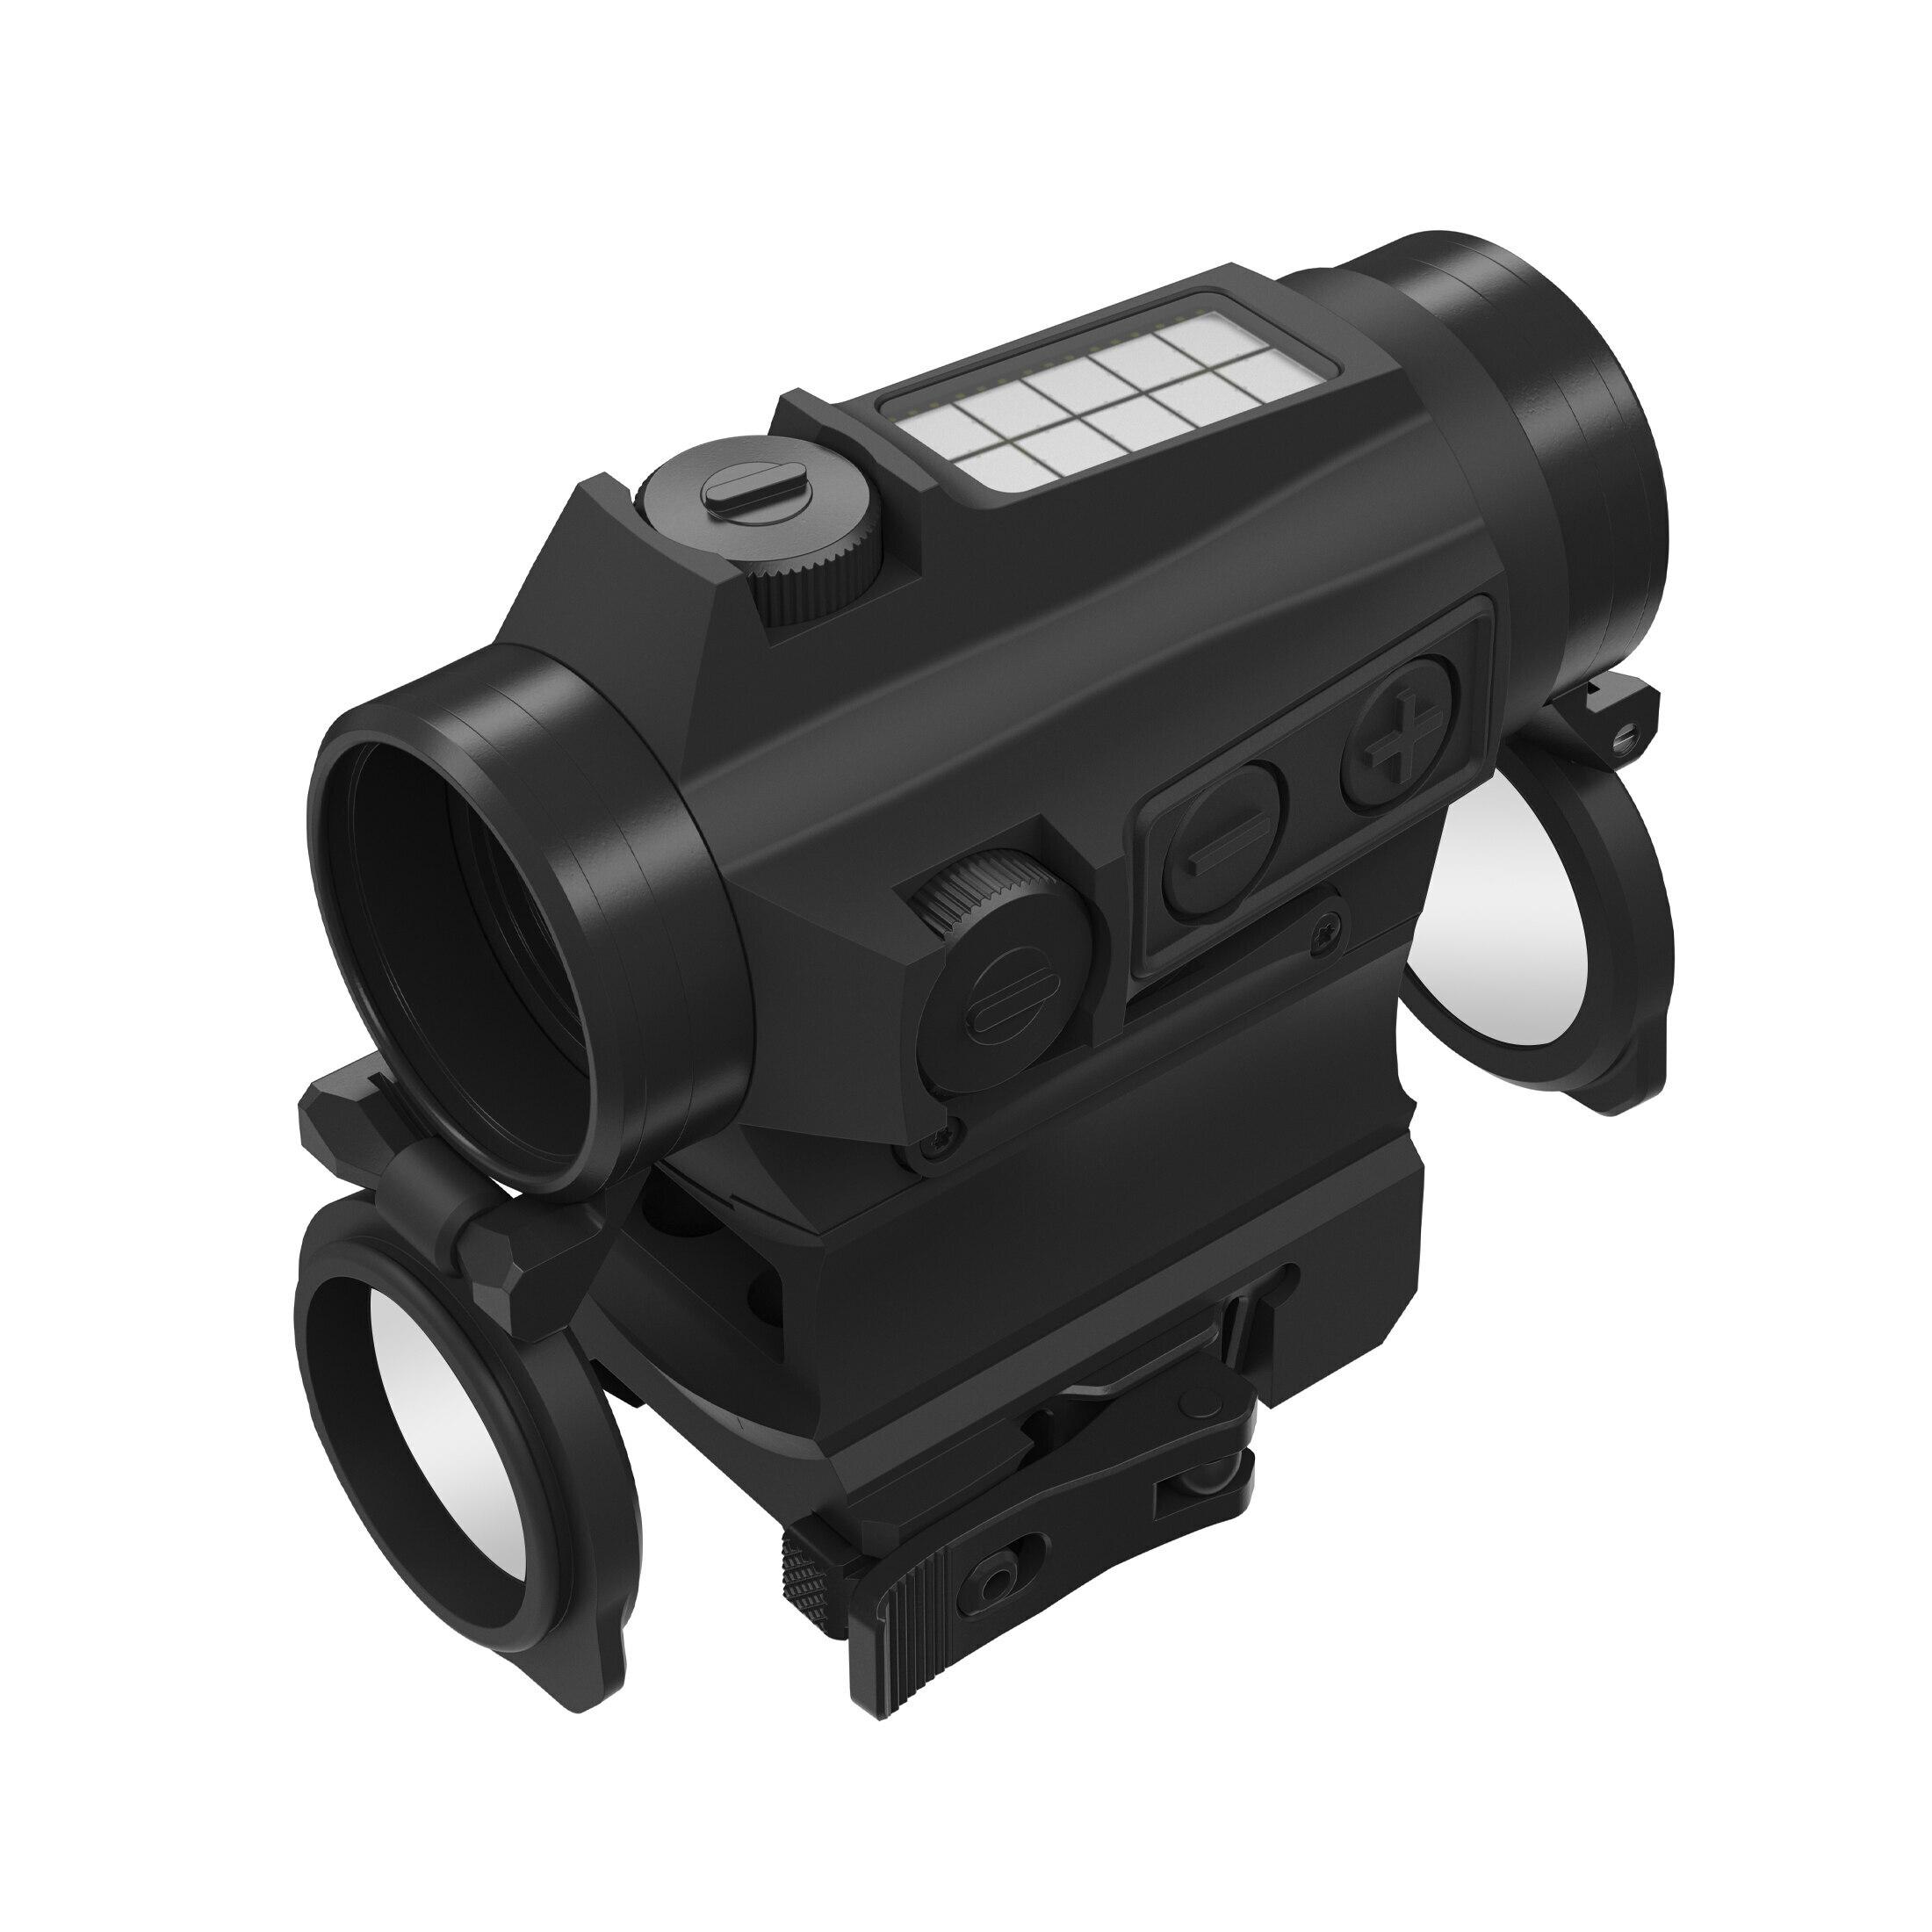 Holosun Dot Sight CLASSIC HS515C-M